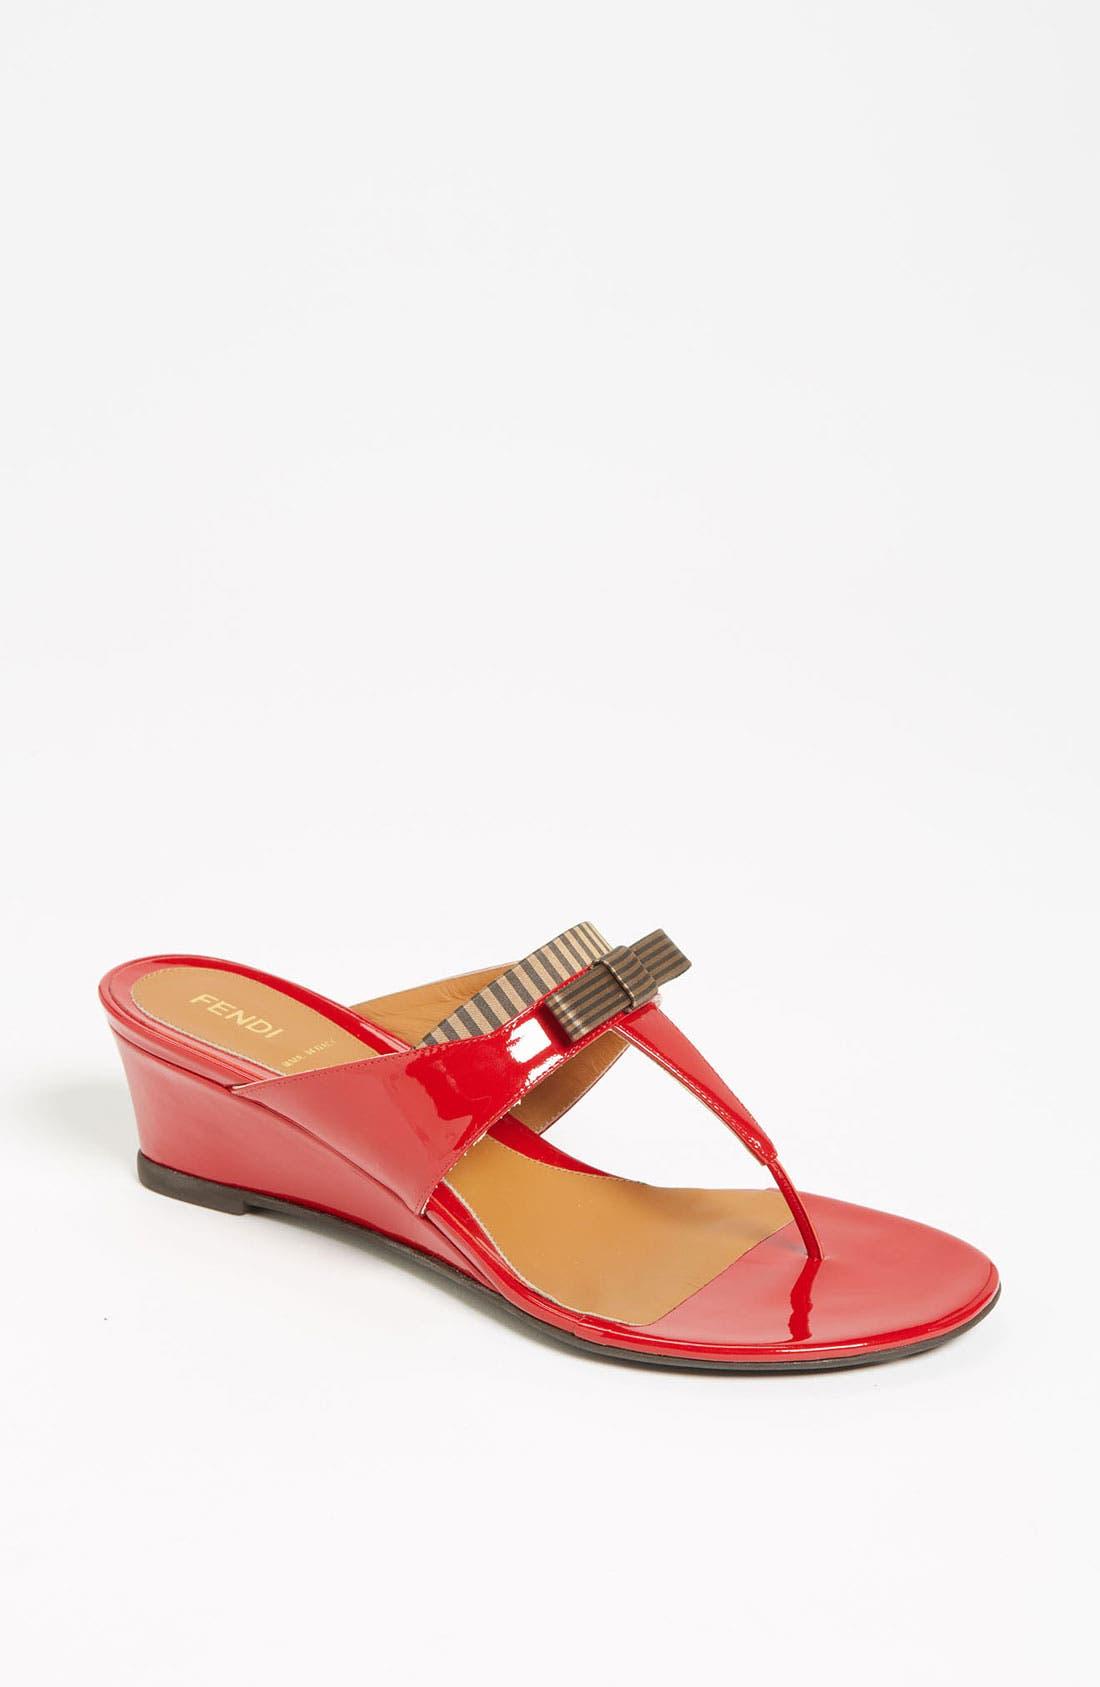 Main Image - Fendi 'Charleston' Thong Sandal